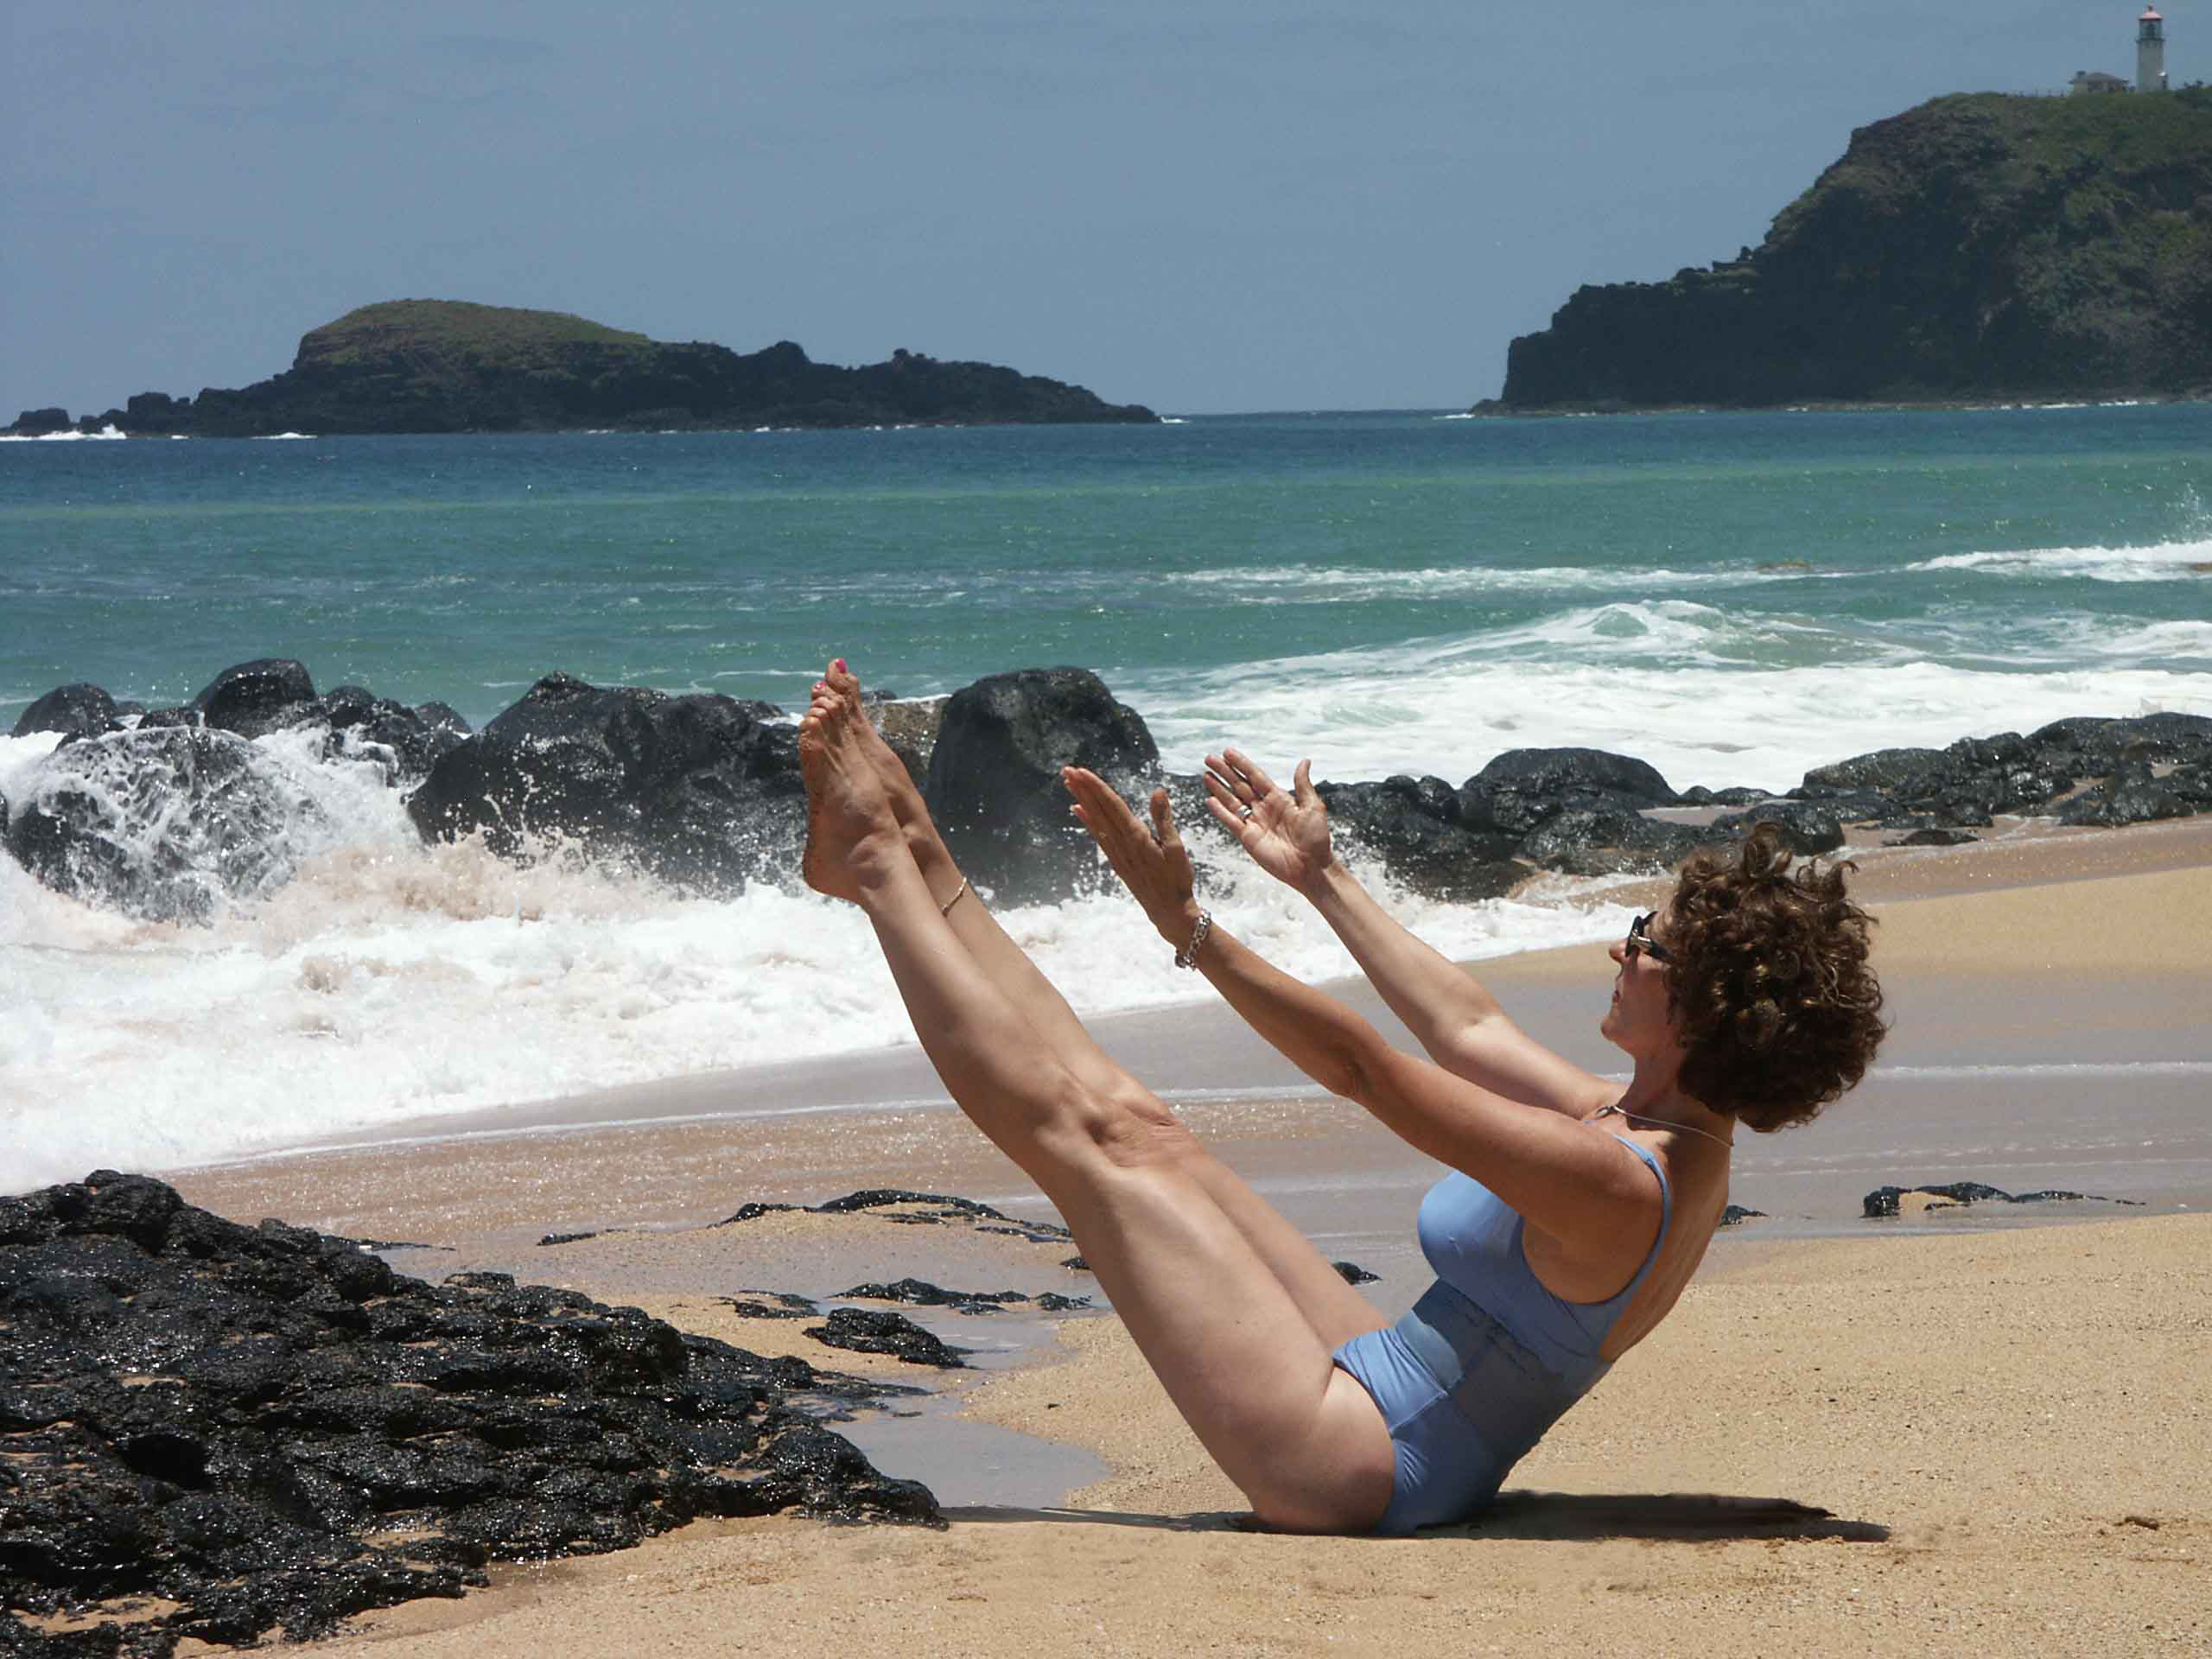 pilates-beach-pose-sized.jpg